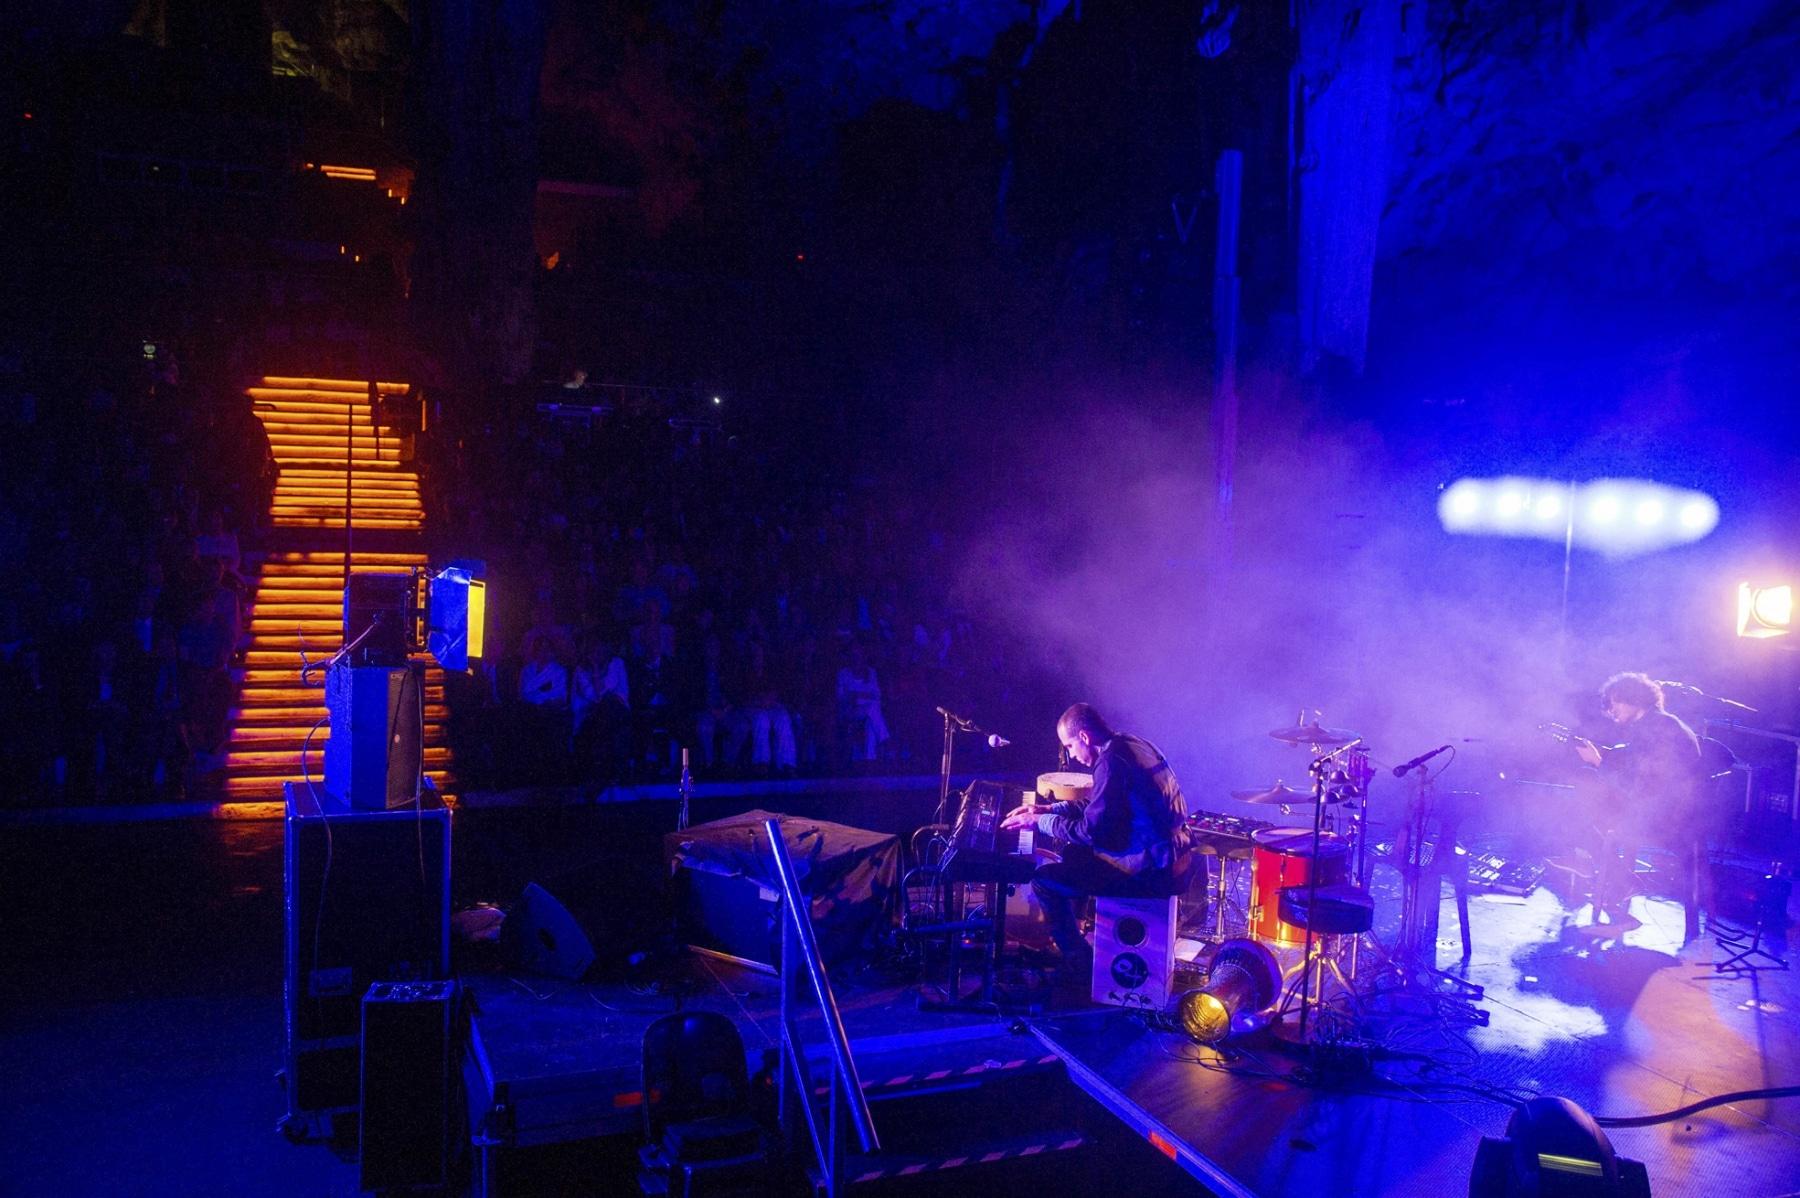 19-mayo-gibraltar-world-music-festival17_14464412515_o